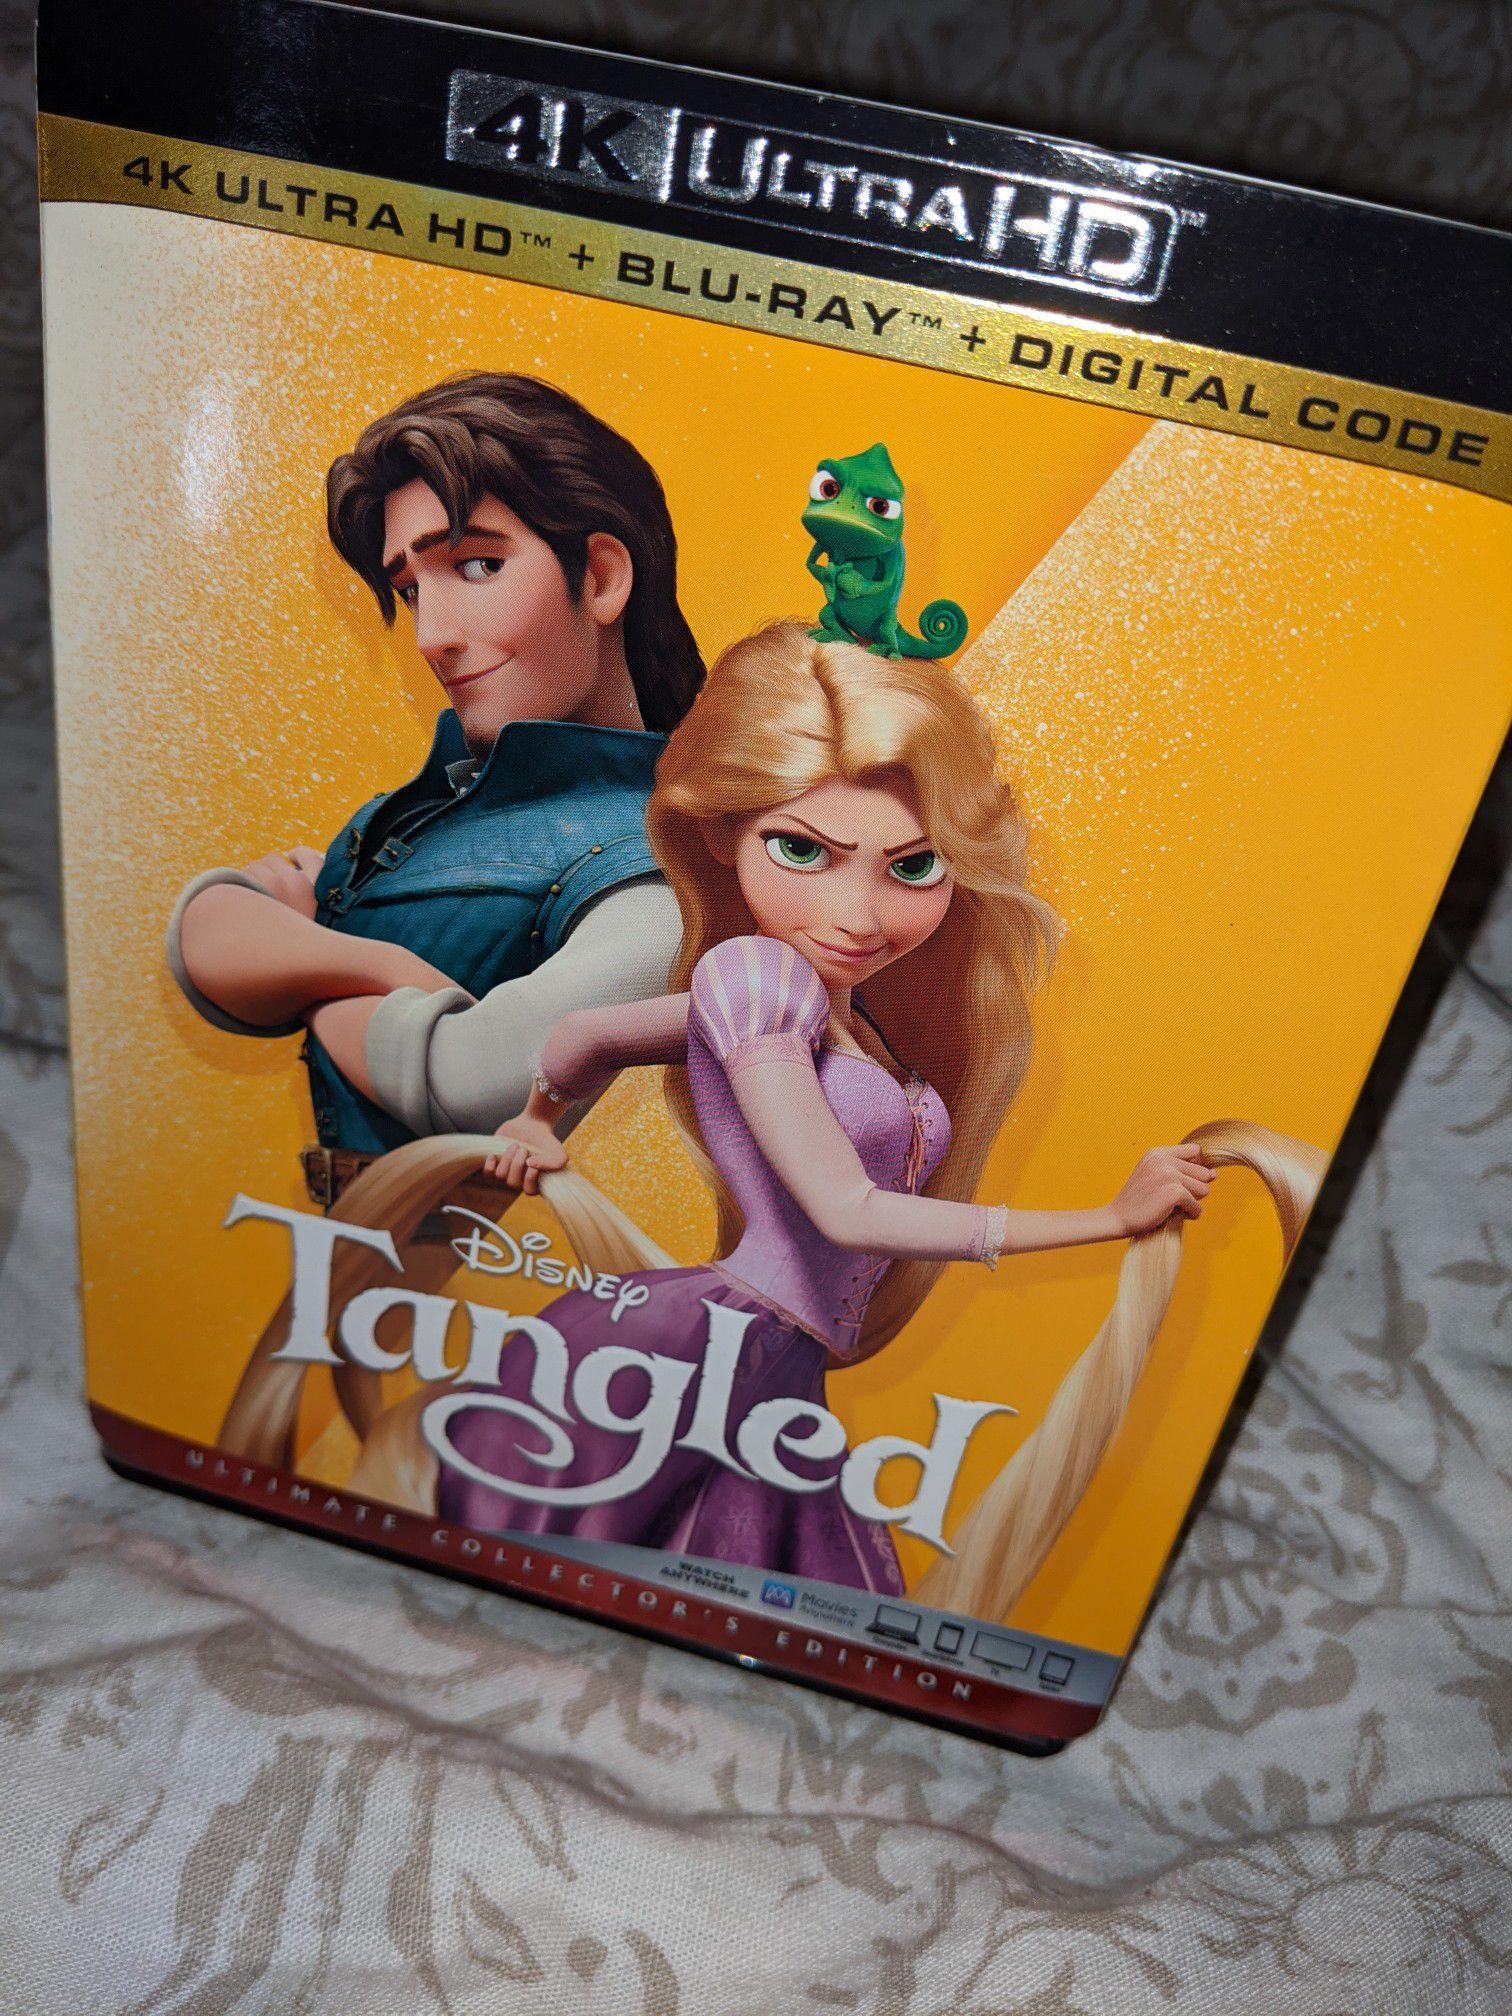 Tangled 4k Blu-ray with digital code